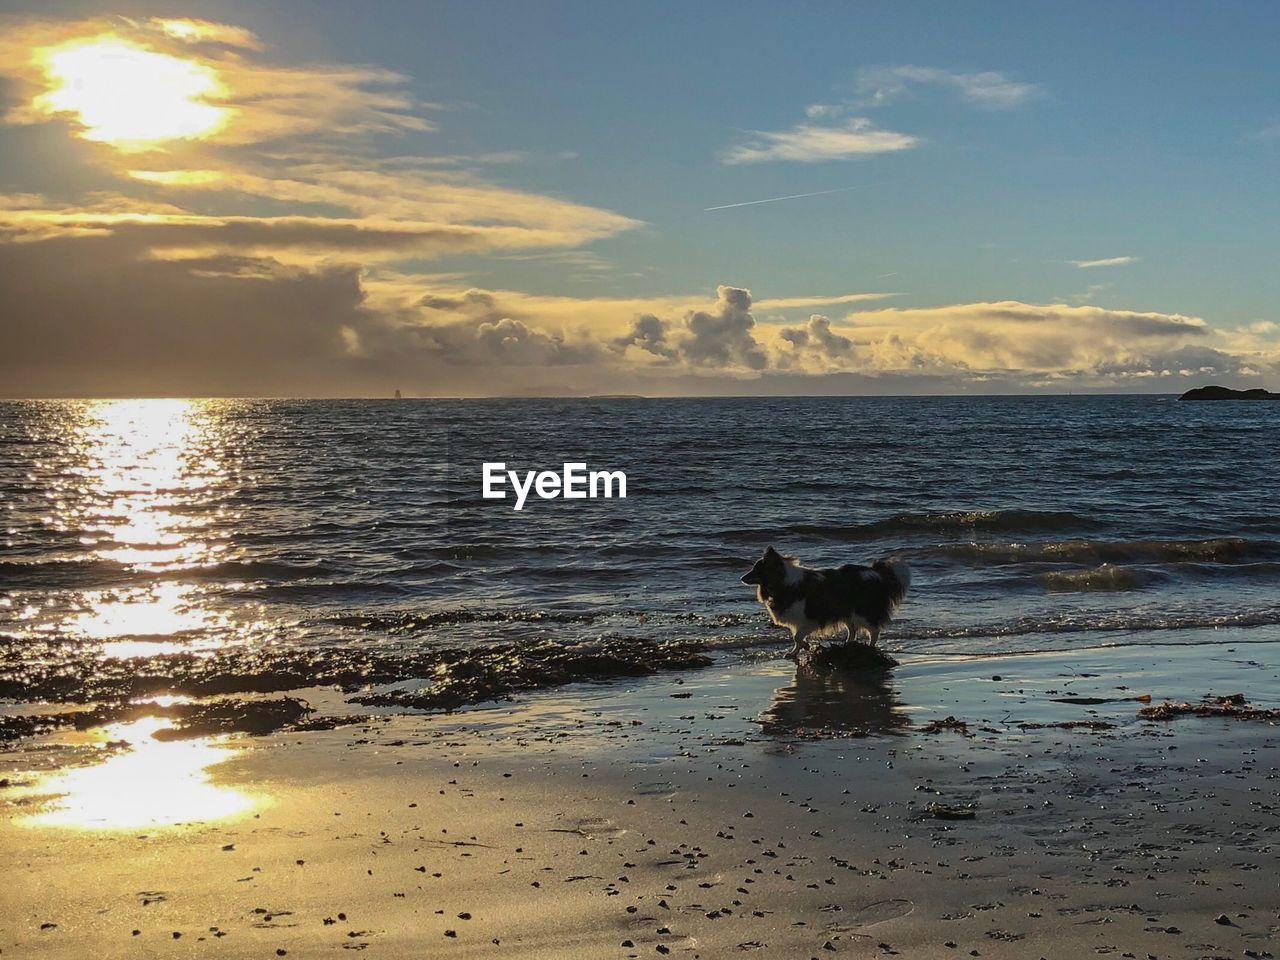 one animal, domestic, domestic animals, canine, mammal, water, dog, pets, sky, animal, animal themes, beach, sea, land, vertebrate, horizon over water, horizon, sunset, cloud - sky, no people